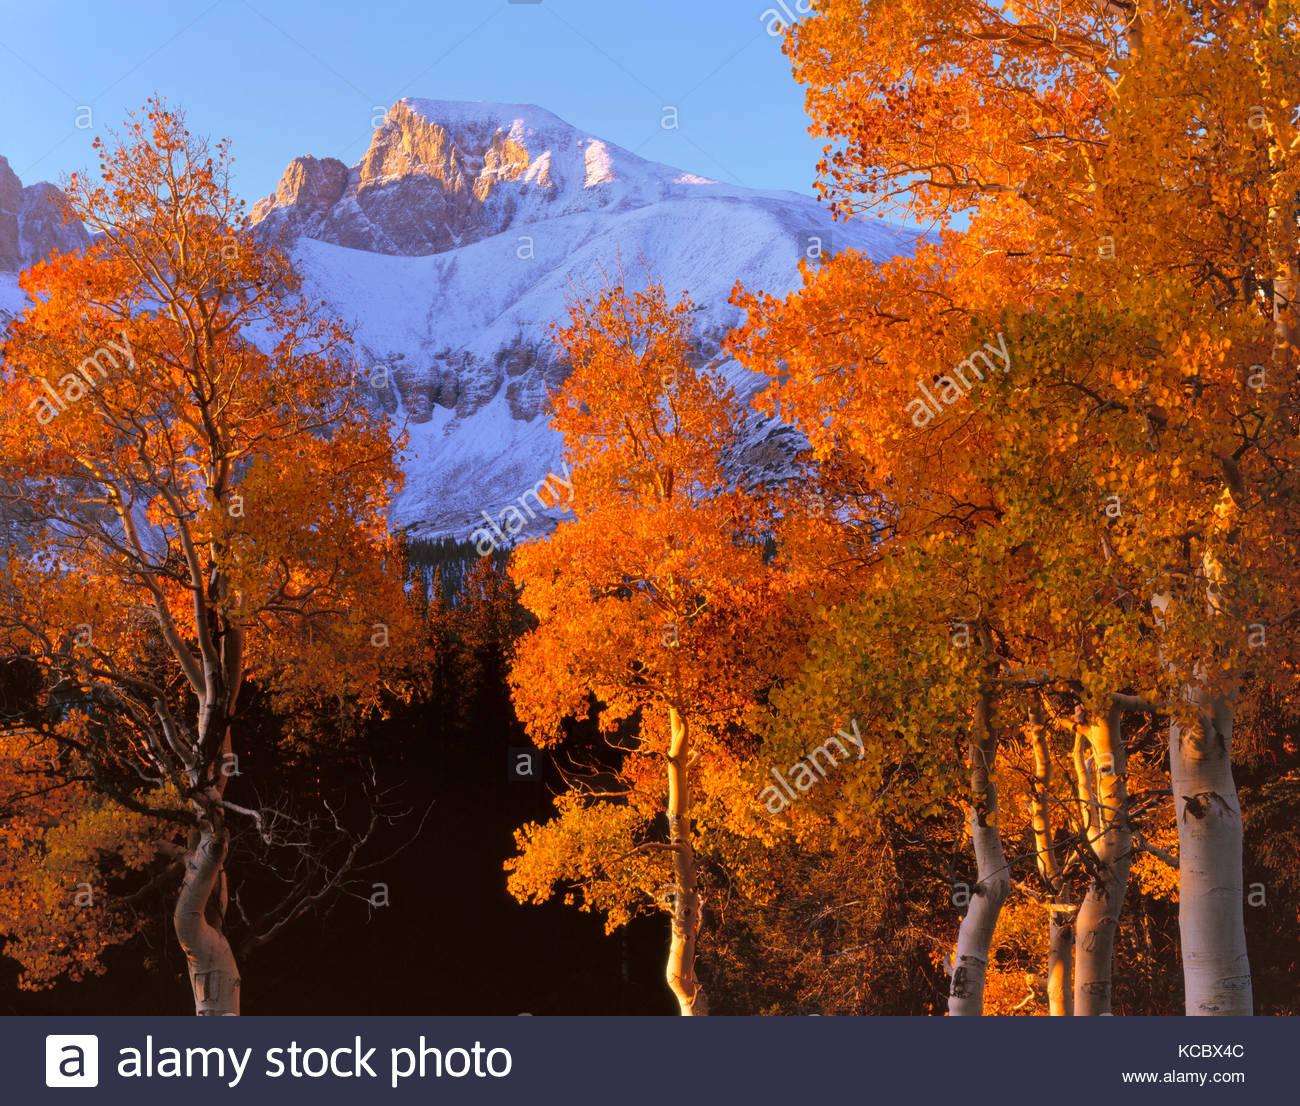 Sunrise on Aspens and Wheeler Peak, Great Basin National Park, Nevada - Stock Image